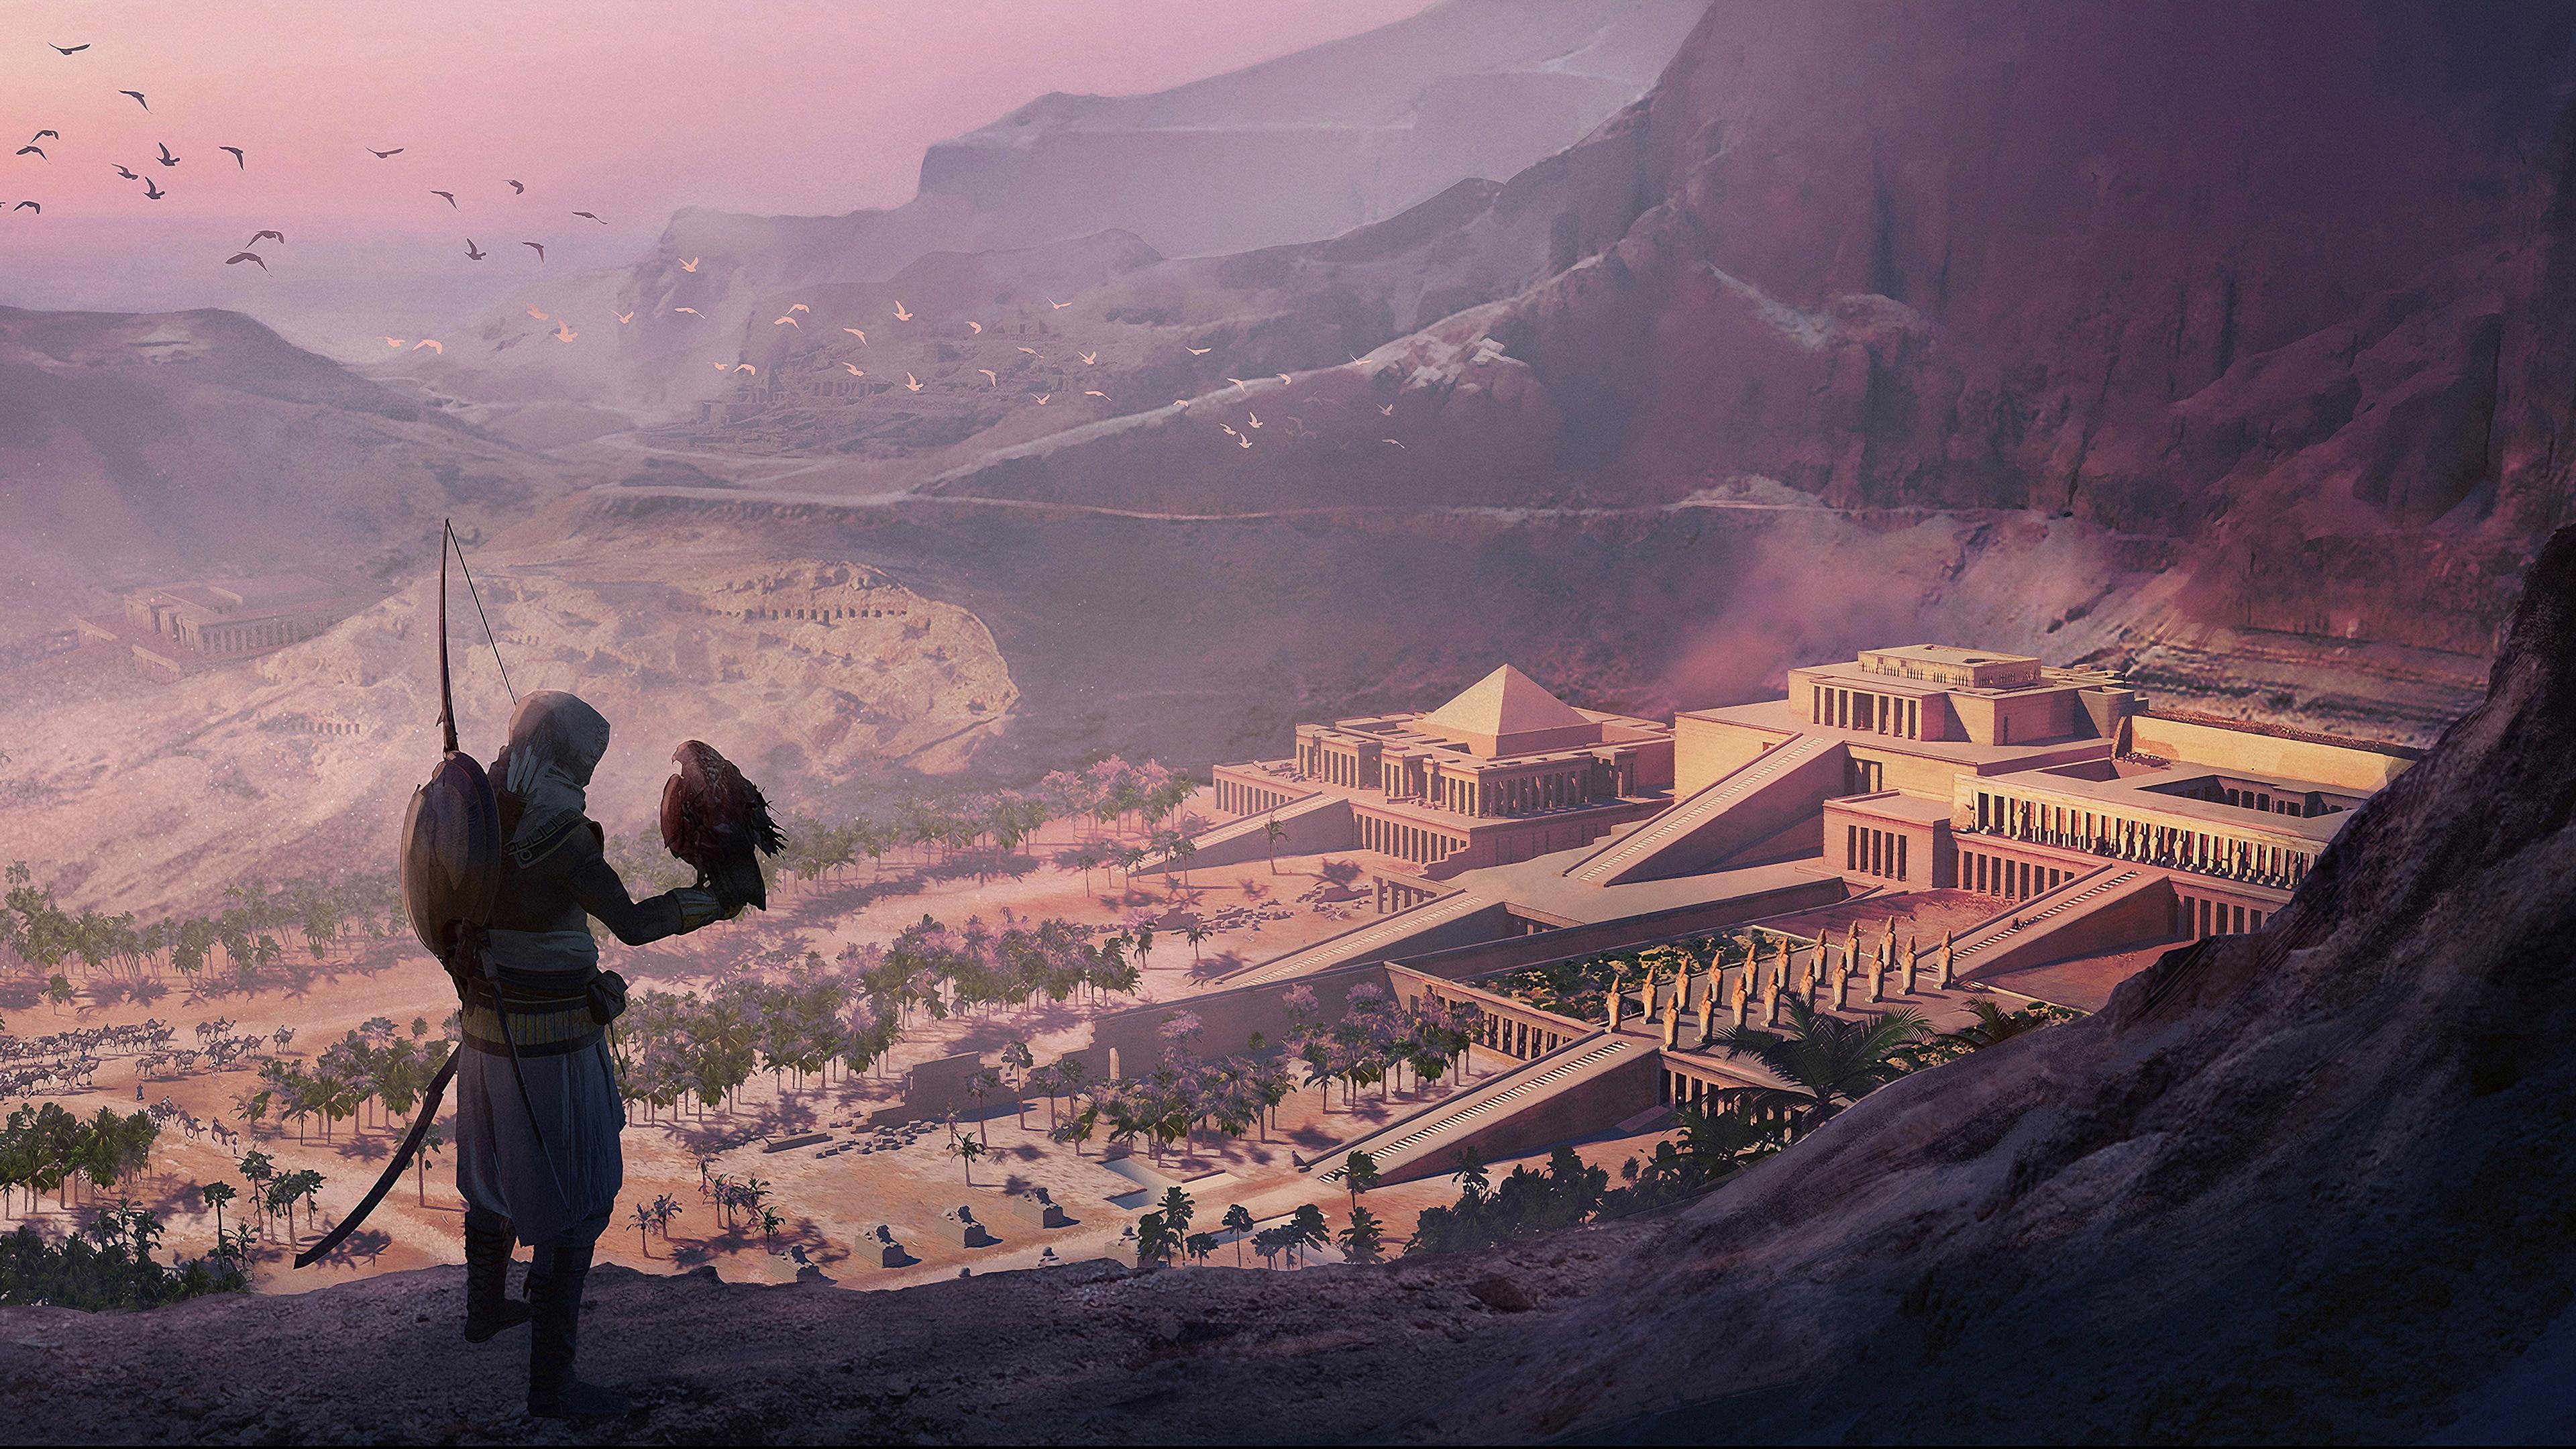 Hd Wallpapers Assassins Creed Assassin S Creed Origins 4k 8k Hd Wallpaper